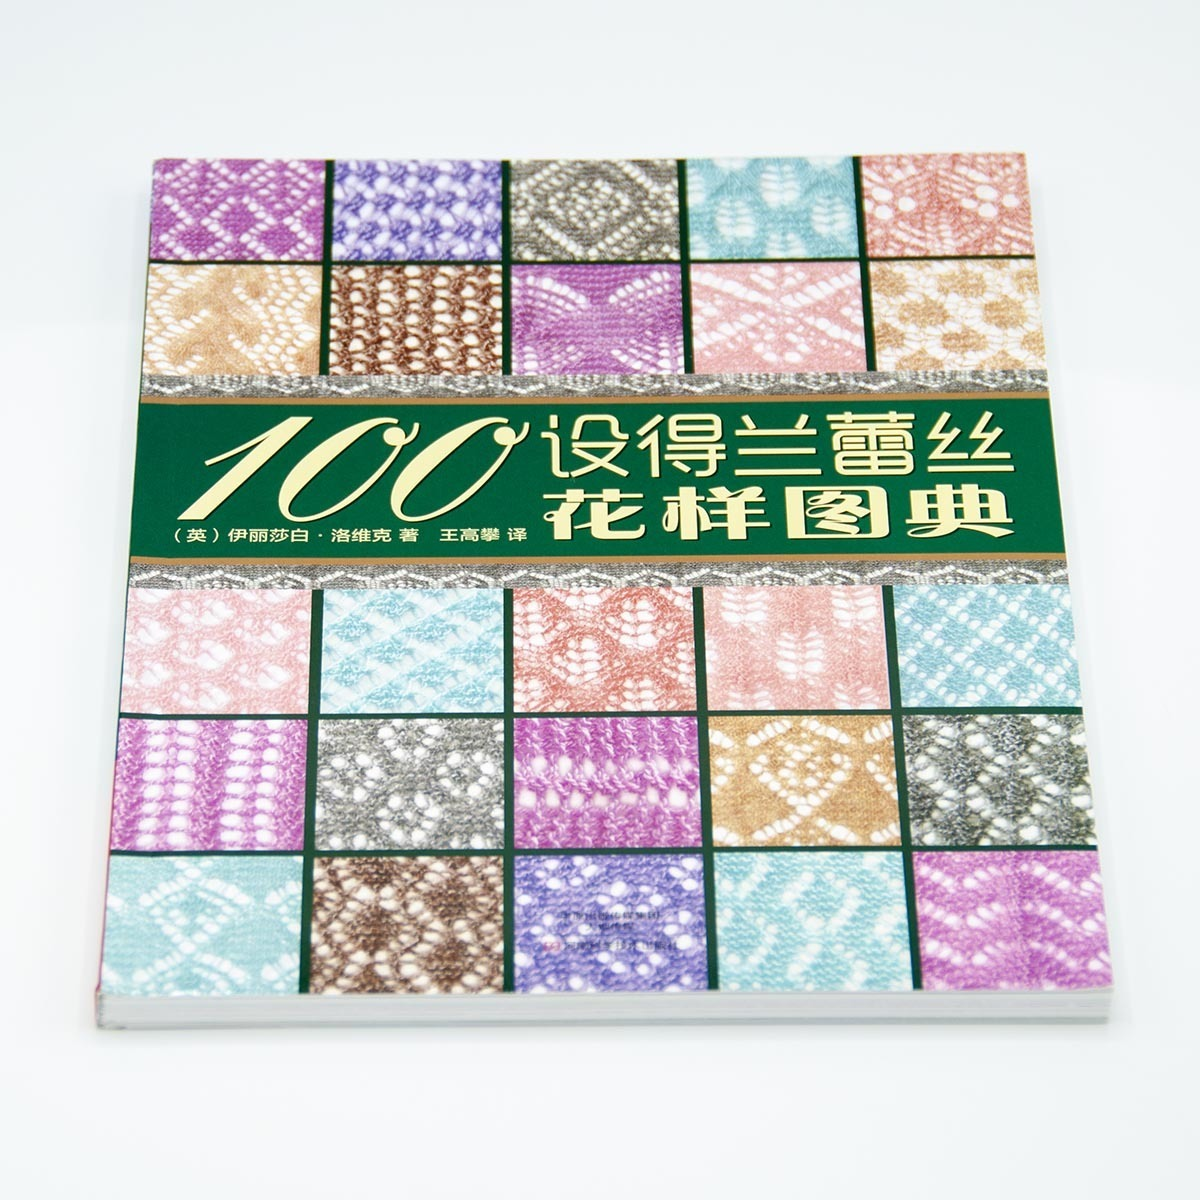 Книга 100 узоров - ажуры